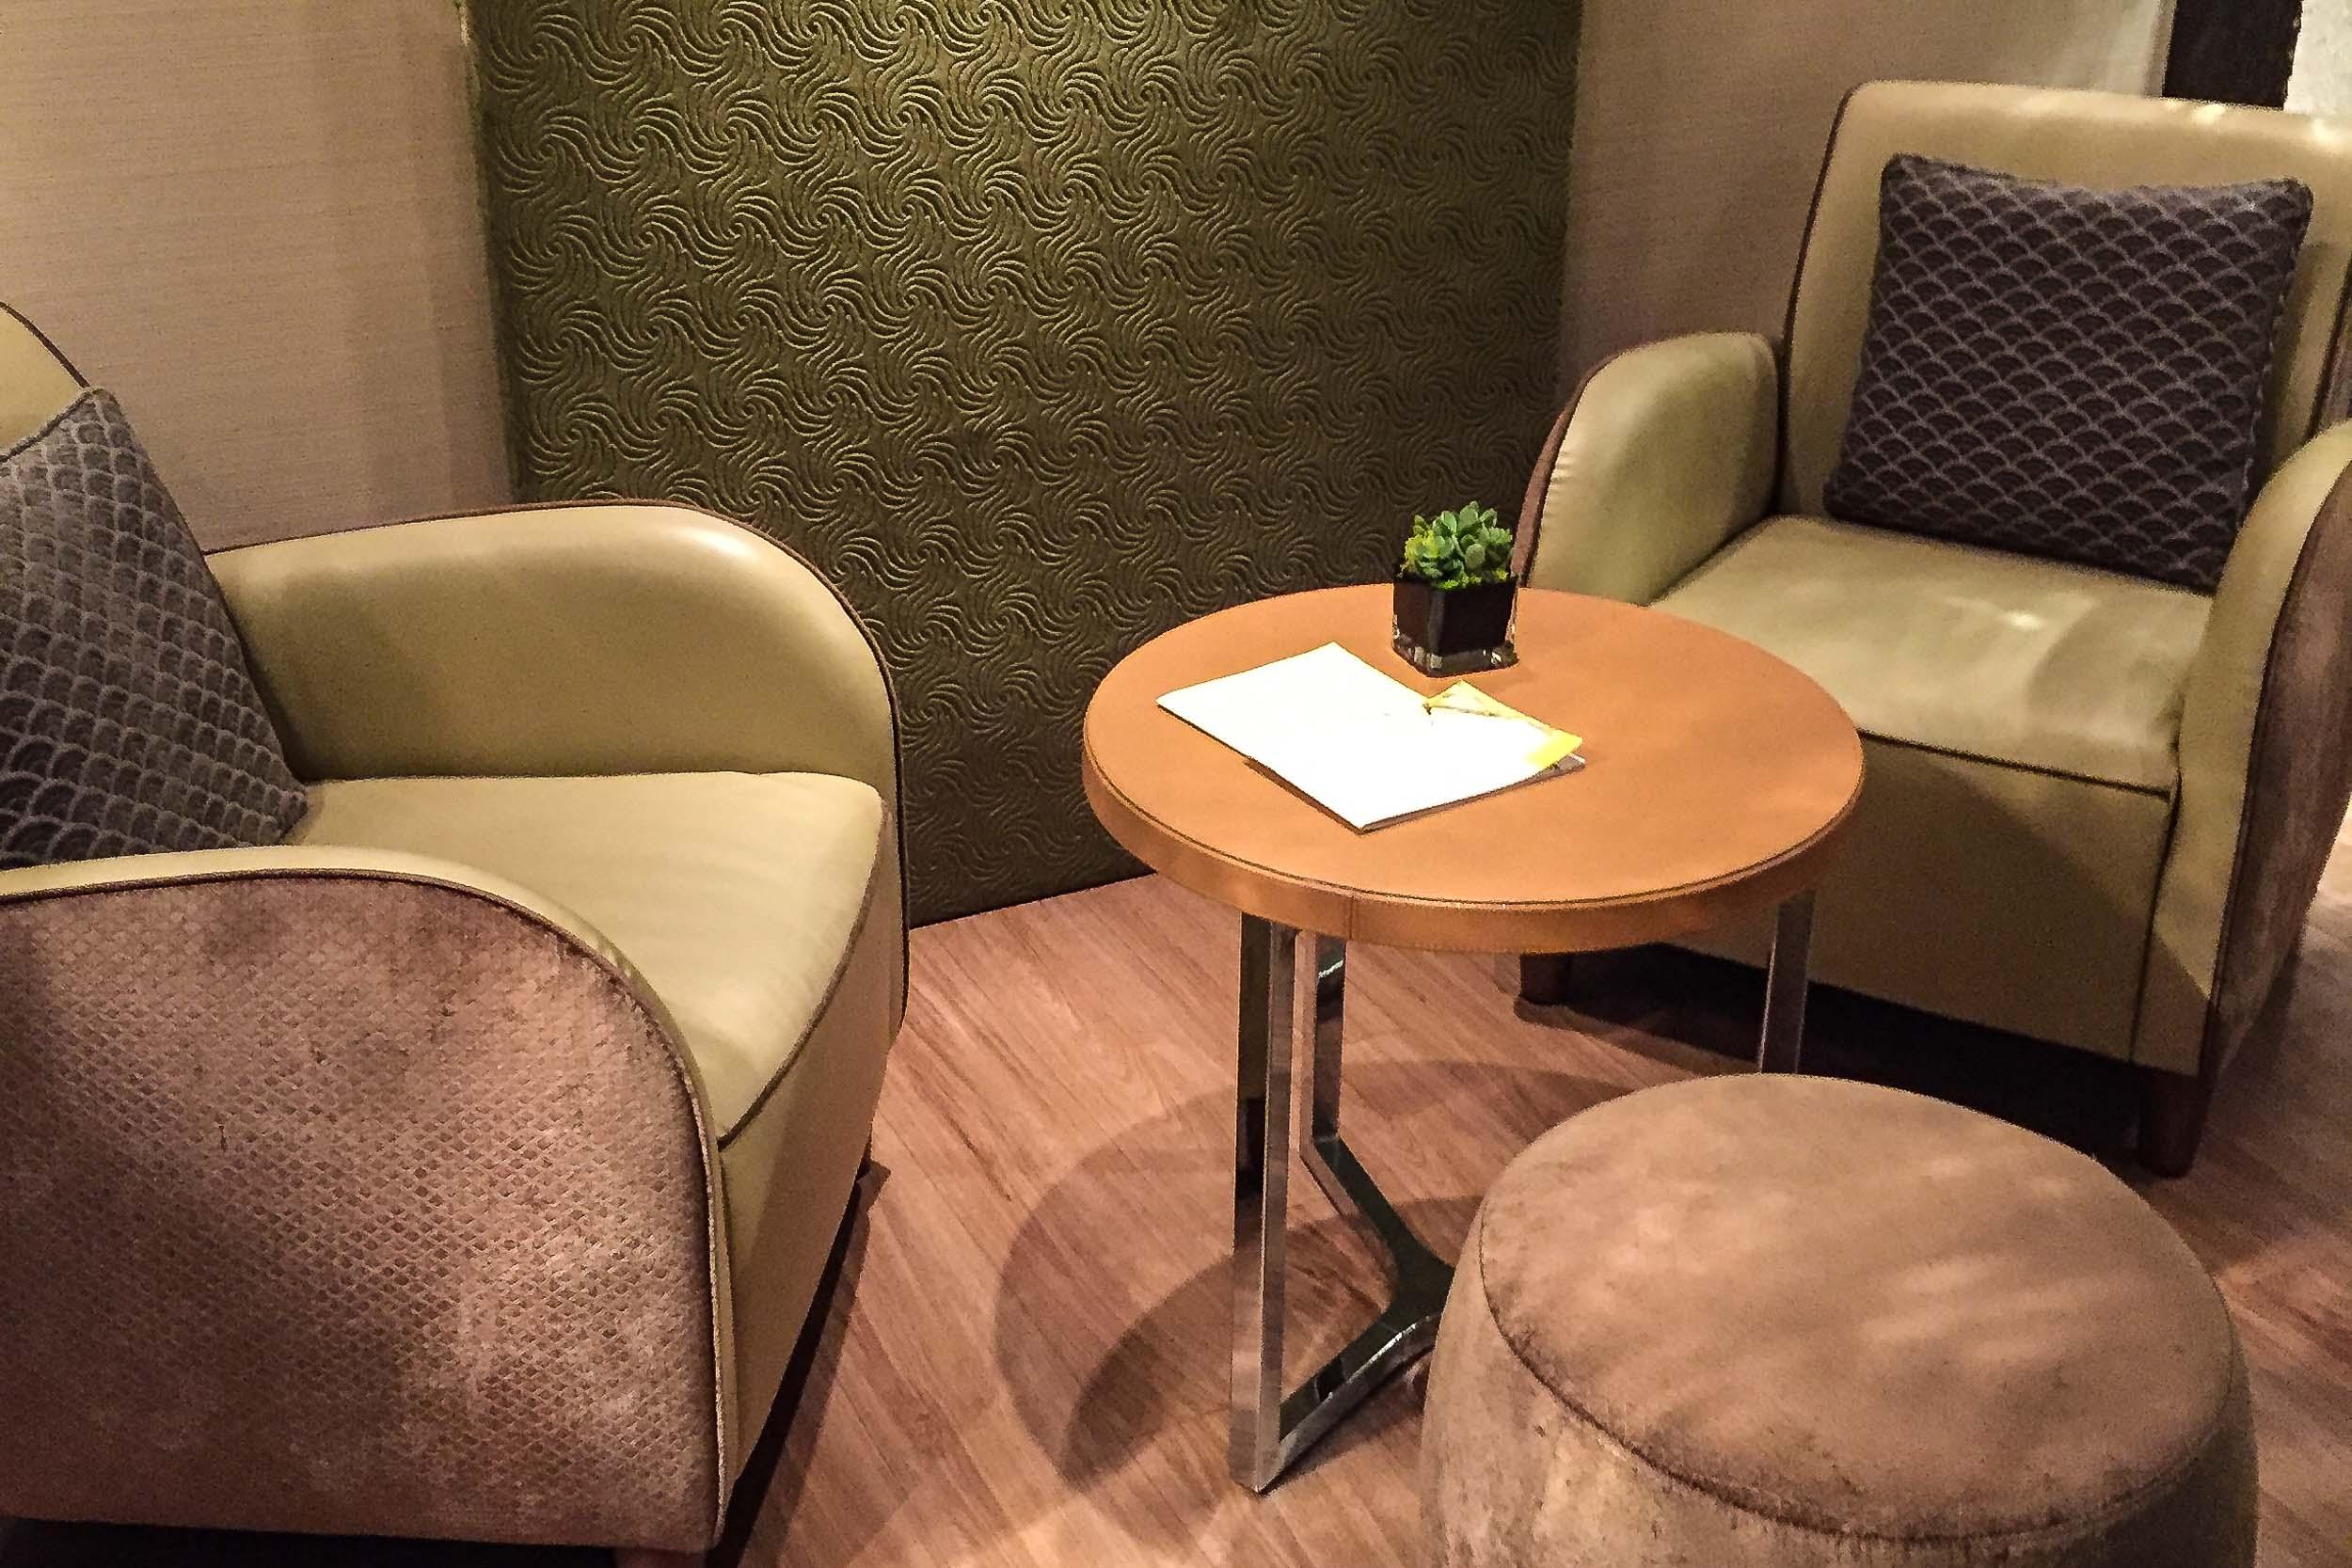 Spa consultation area at the Fullerton Hotel.jpg